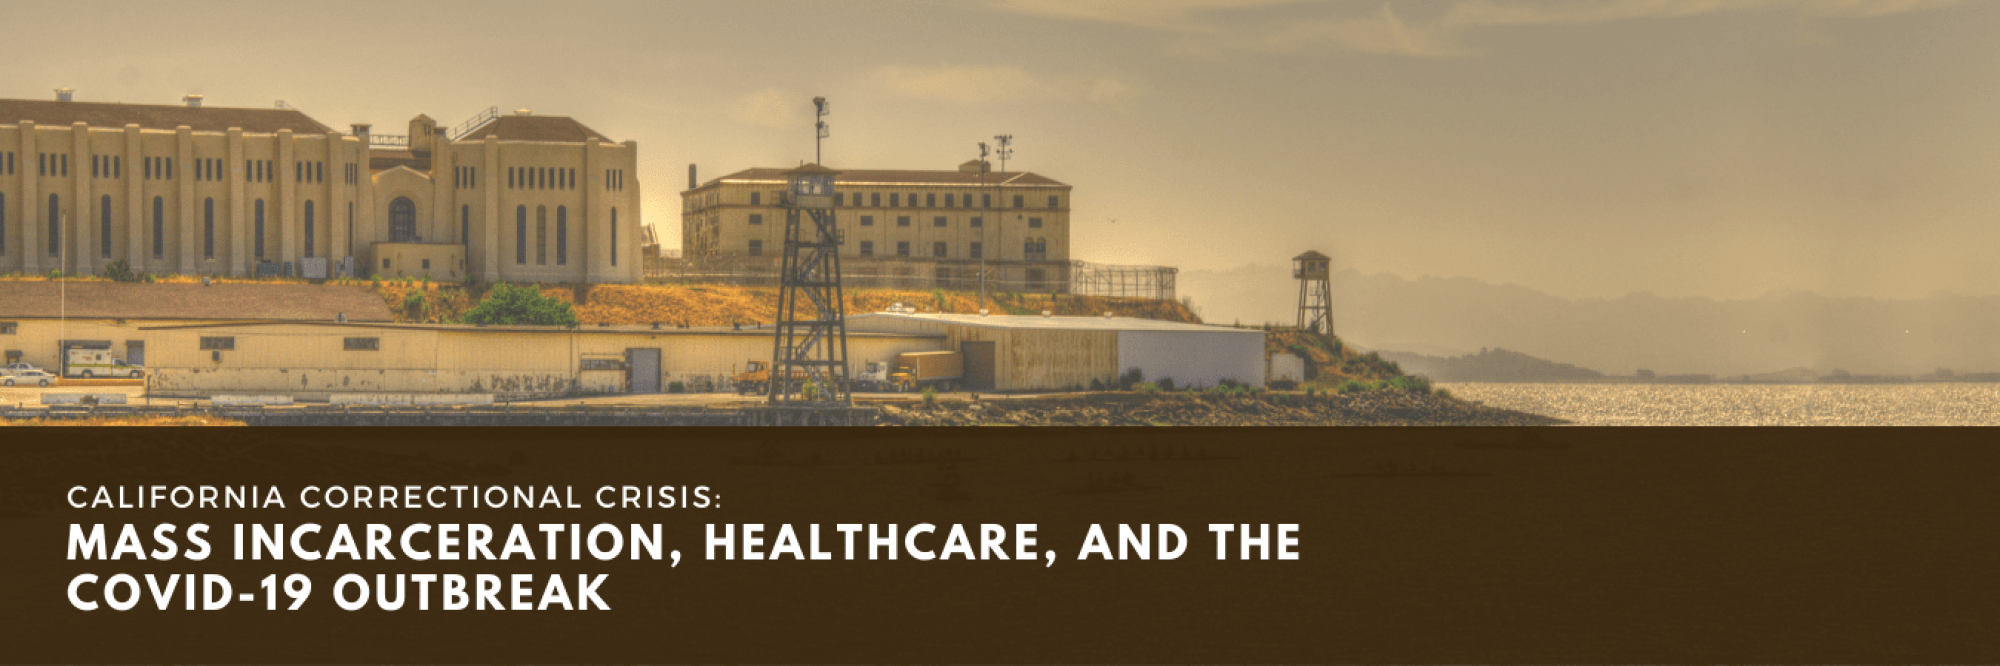 California Correctional Crisis: Mass Incarceration, Healthcare, and the COVID-19 Outbreak